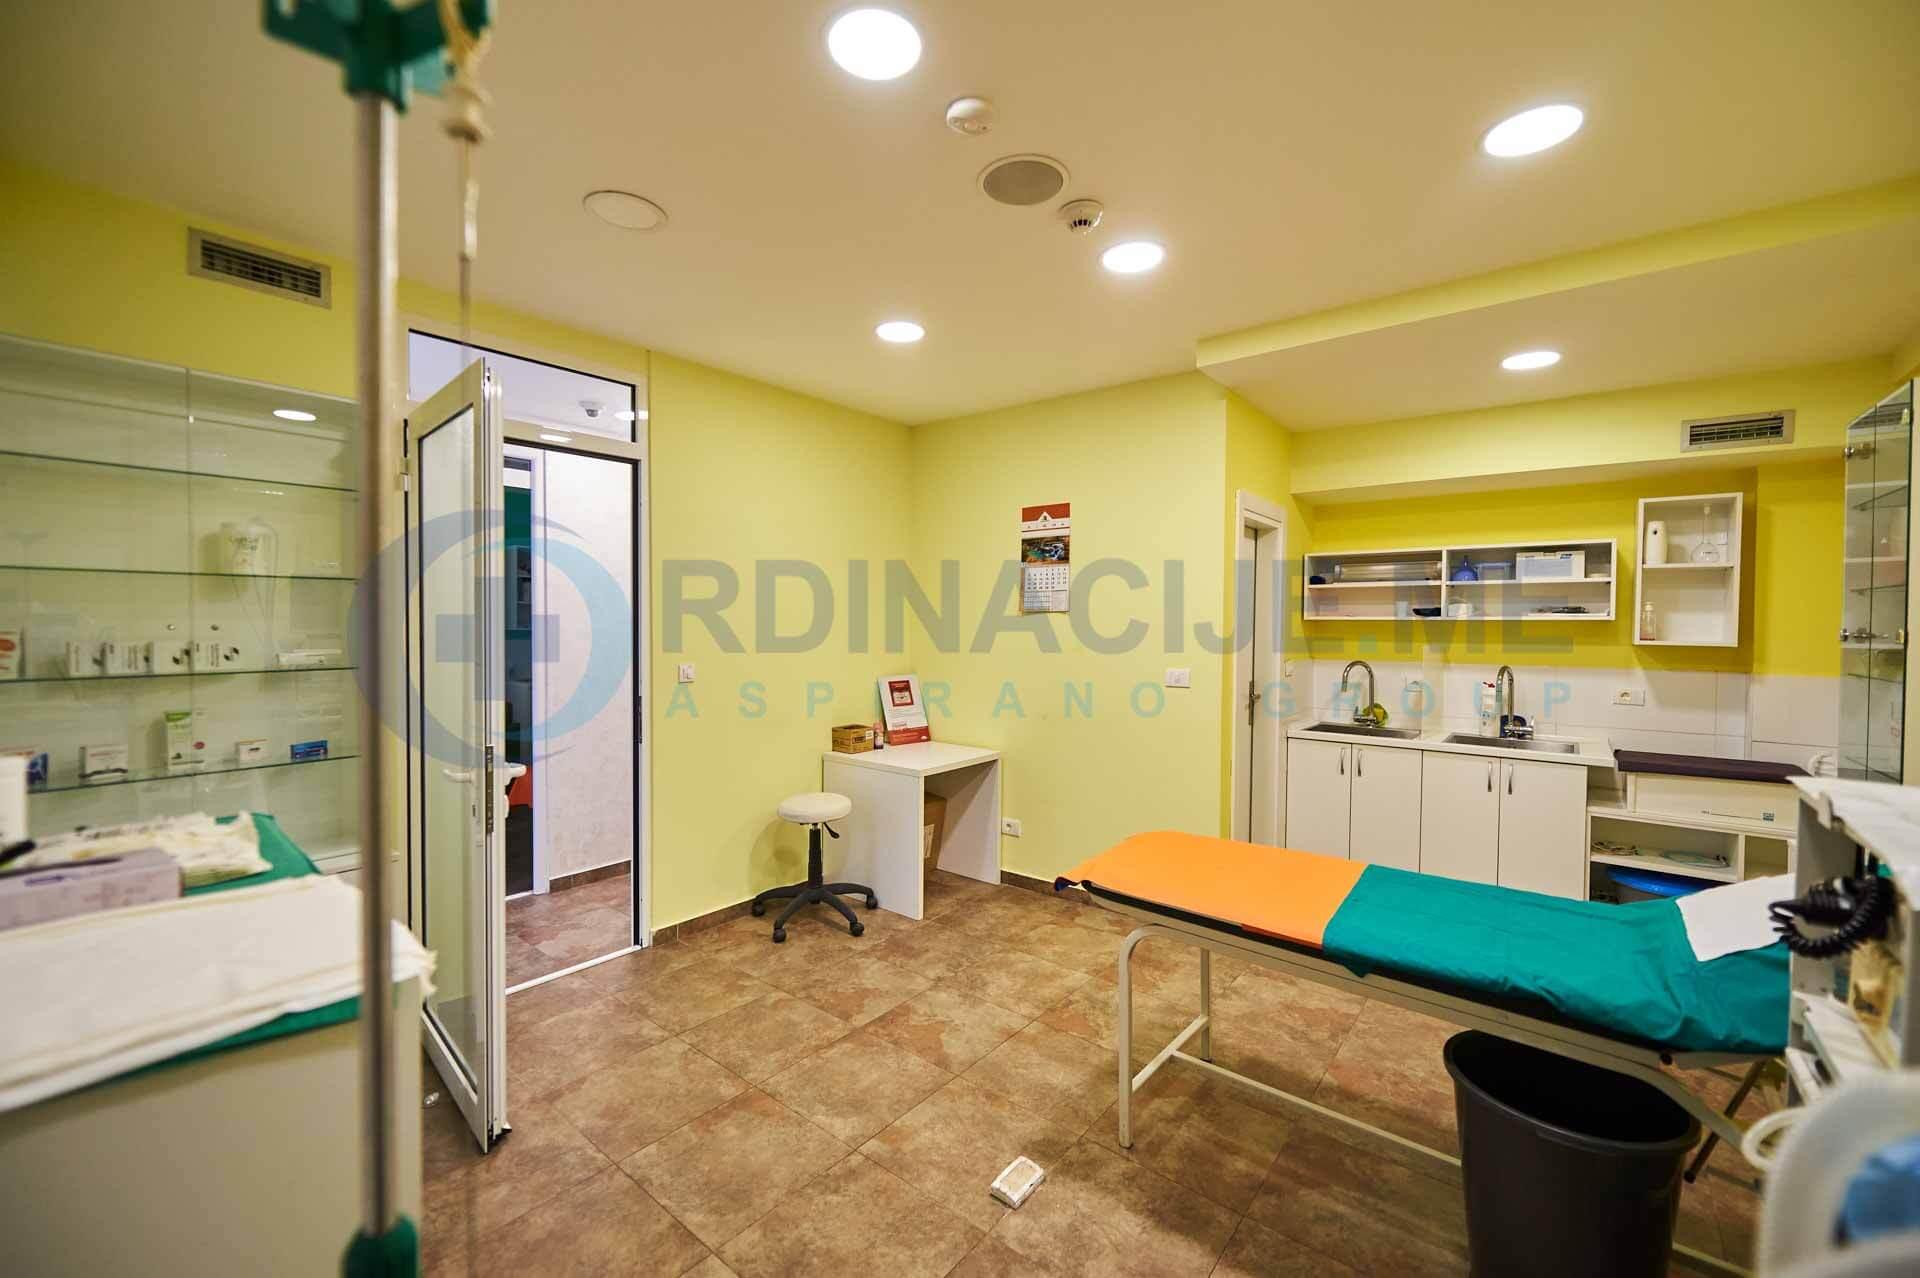 poliklinika-rezidencija-zdravlja-kerber_thumbnail